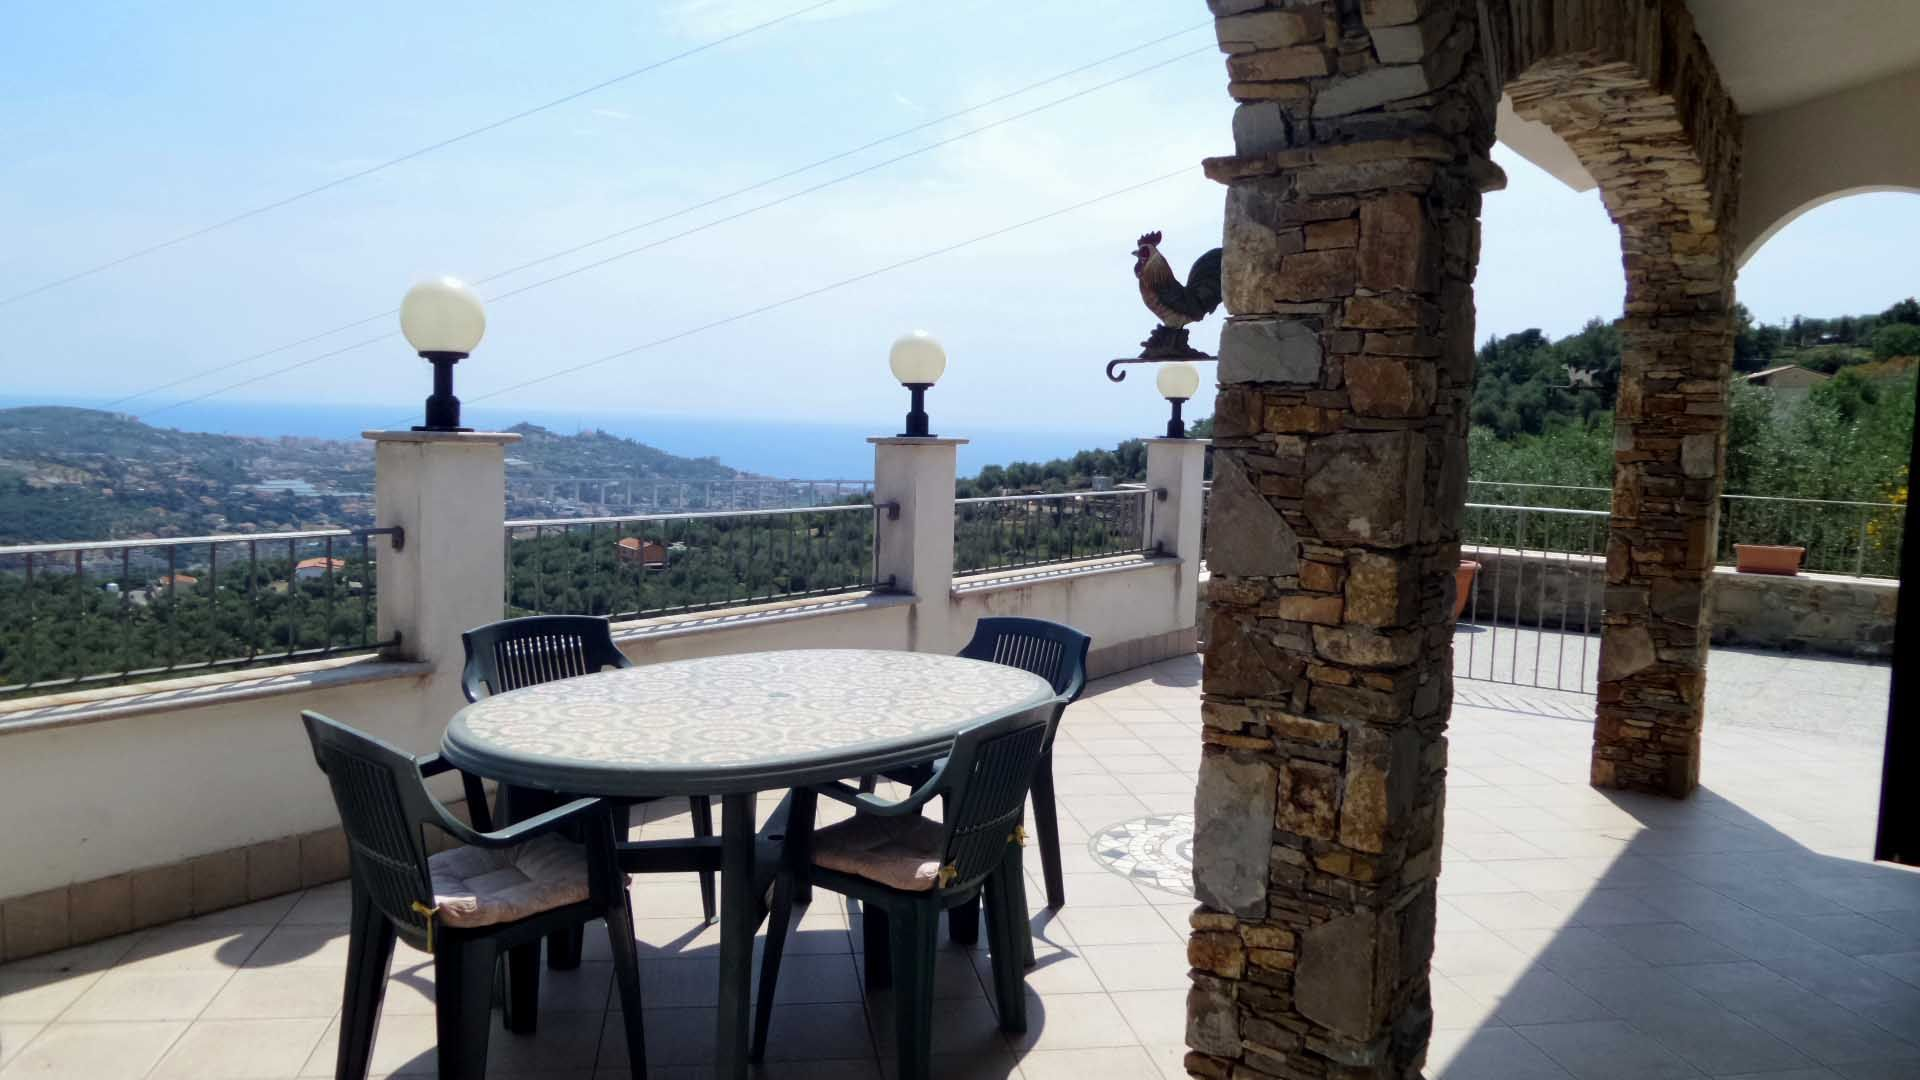 Imperia Liguria Italy property for sale - www.immobiliarelafenice.it